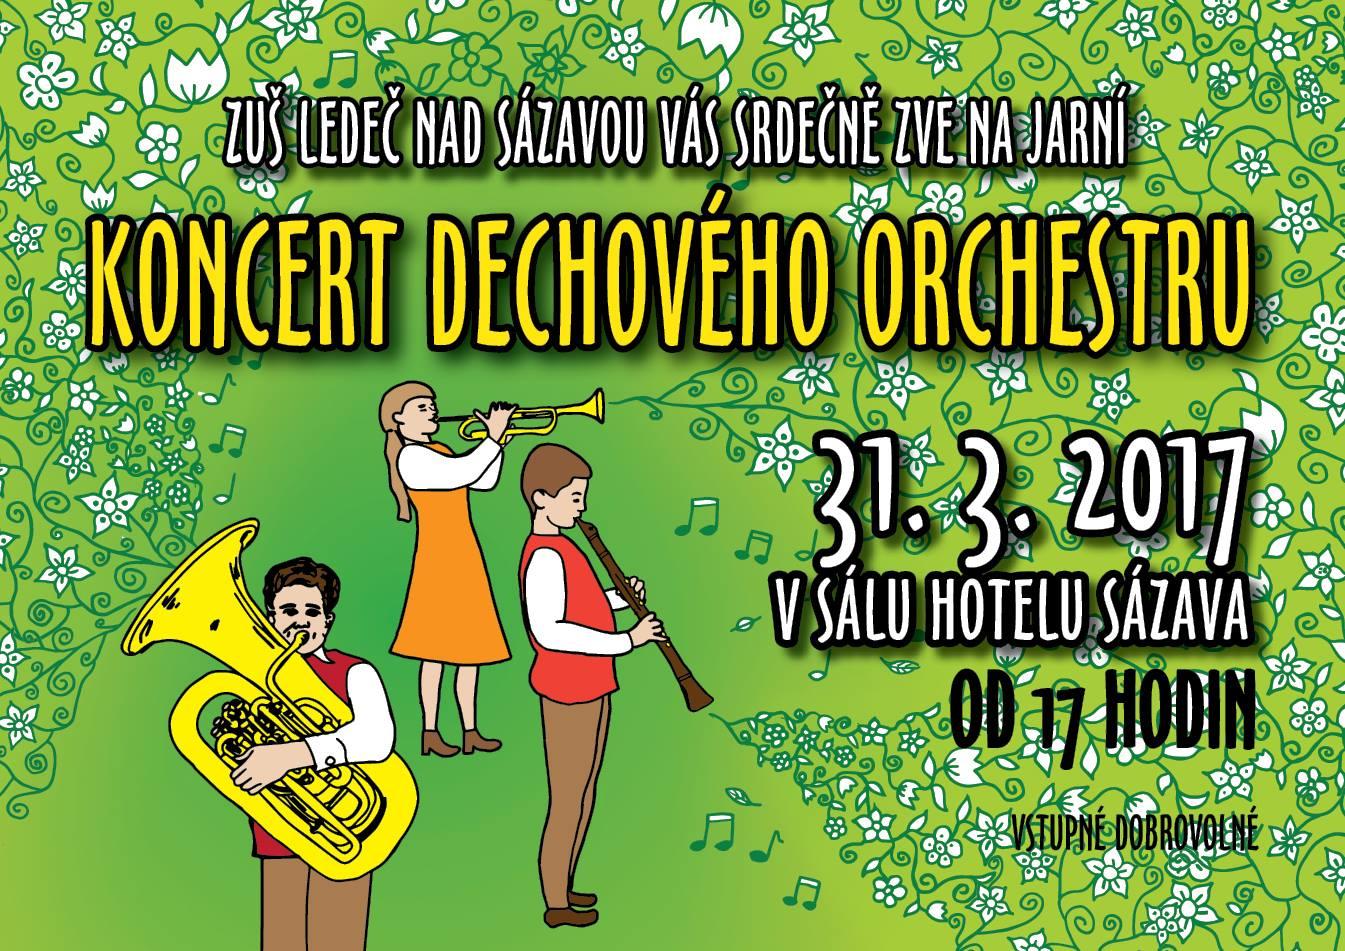 koncert dechového orchestru